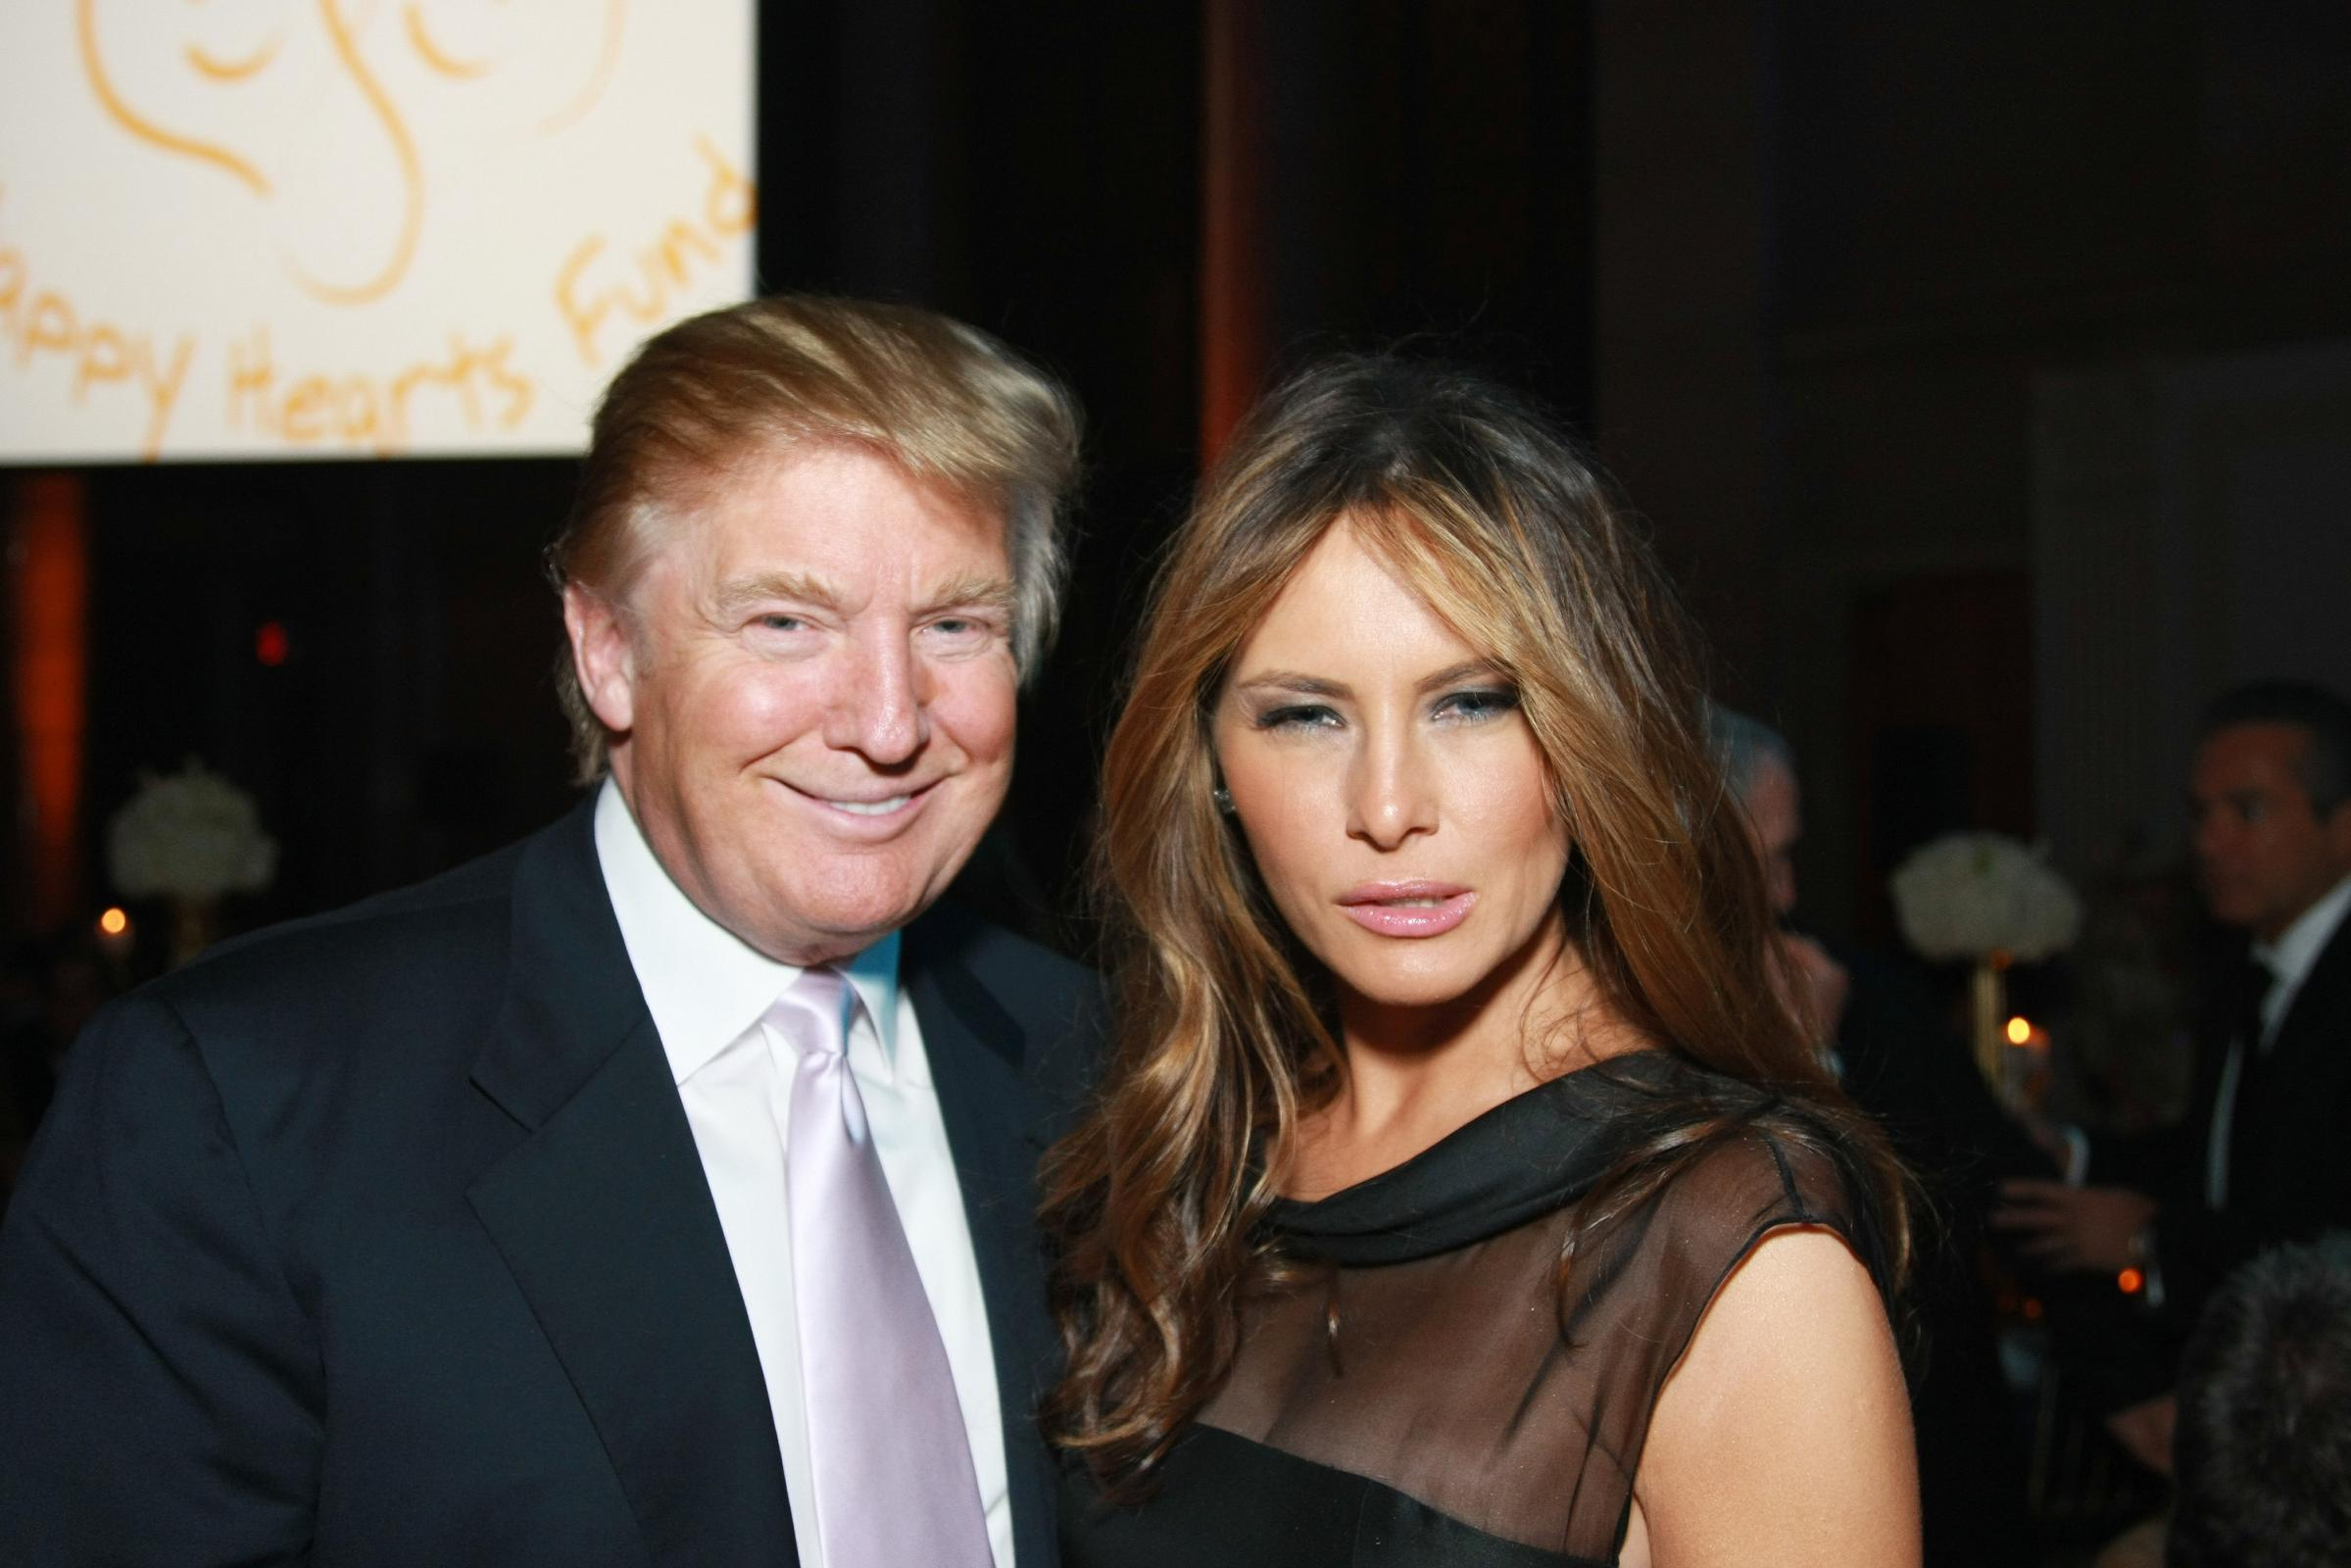 Donald Trump in Melania Trump